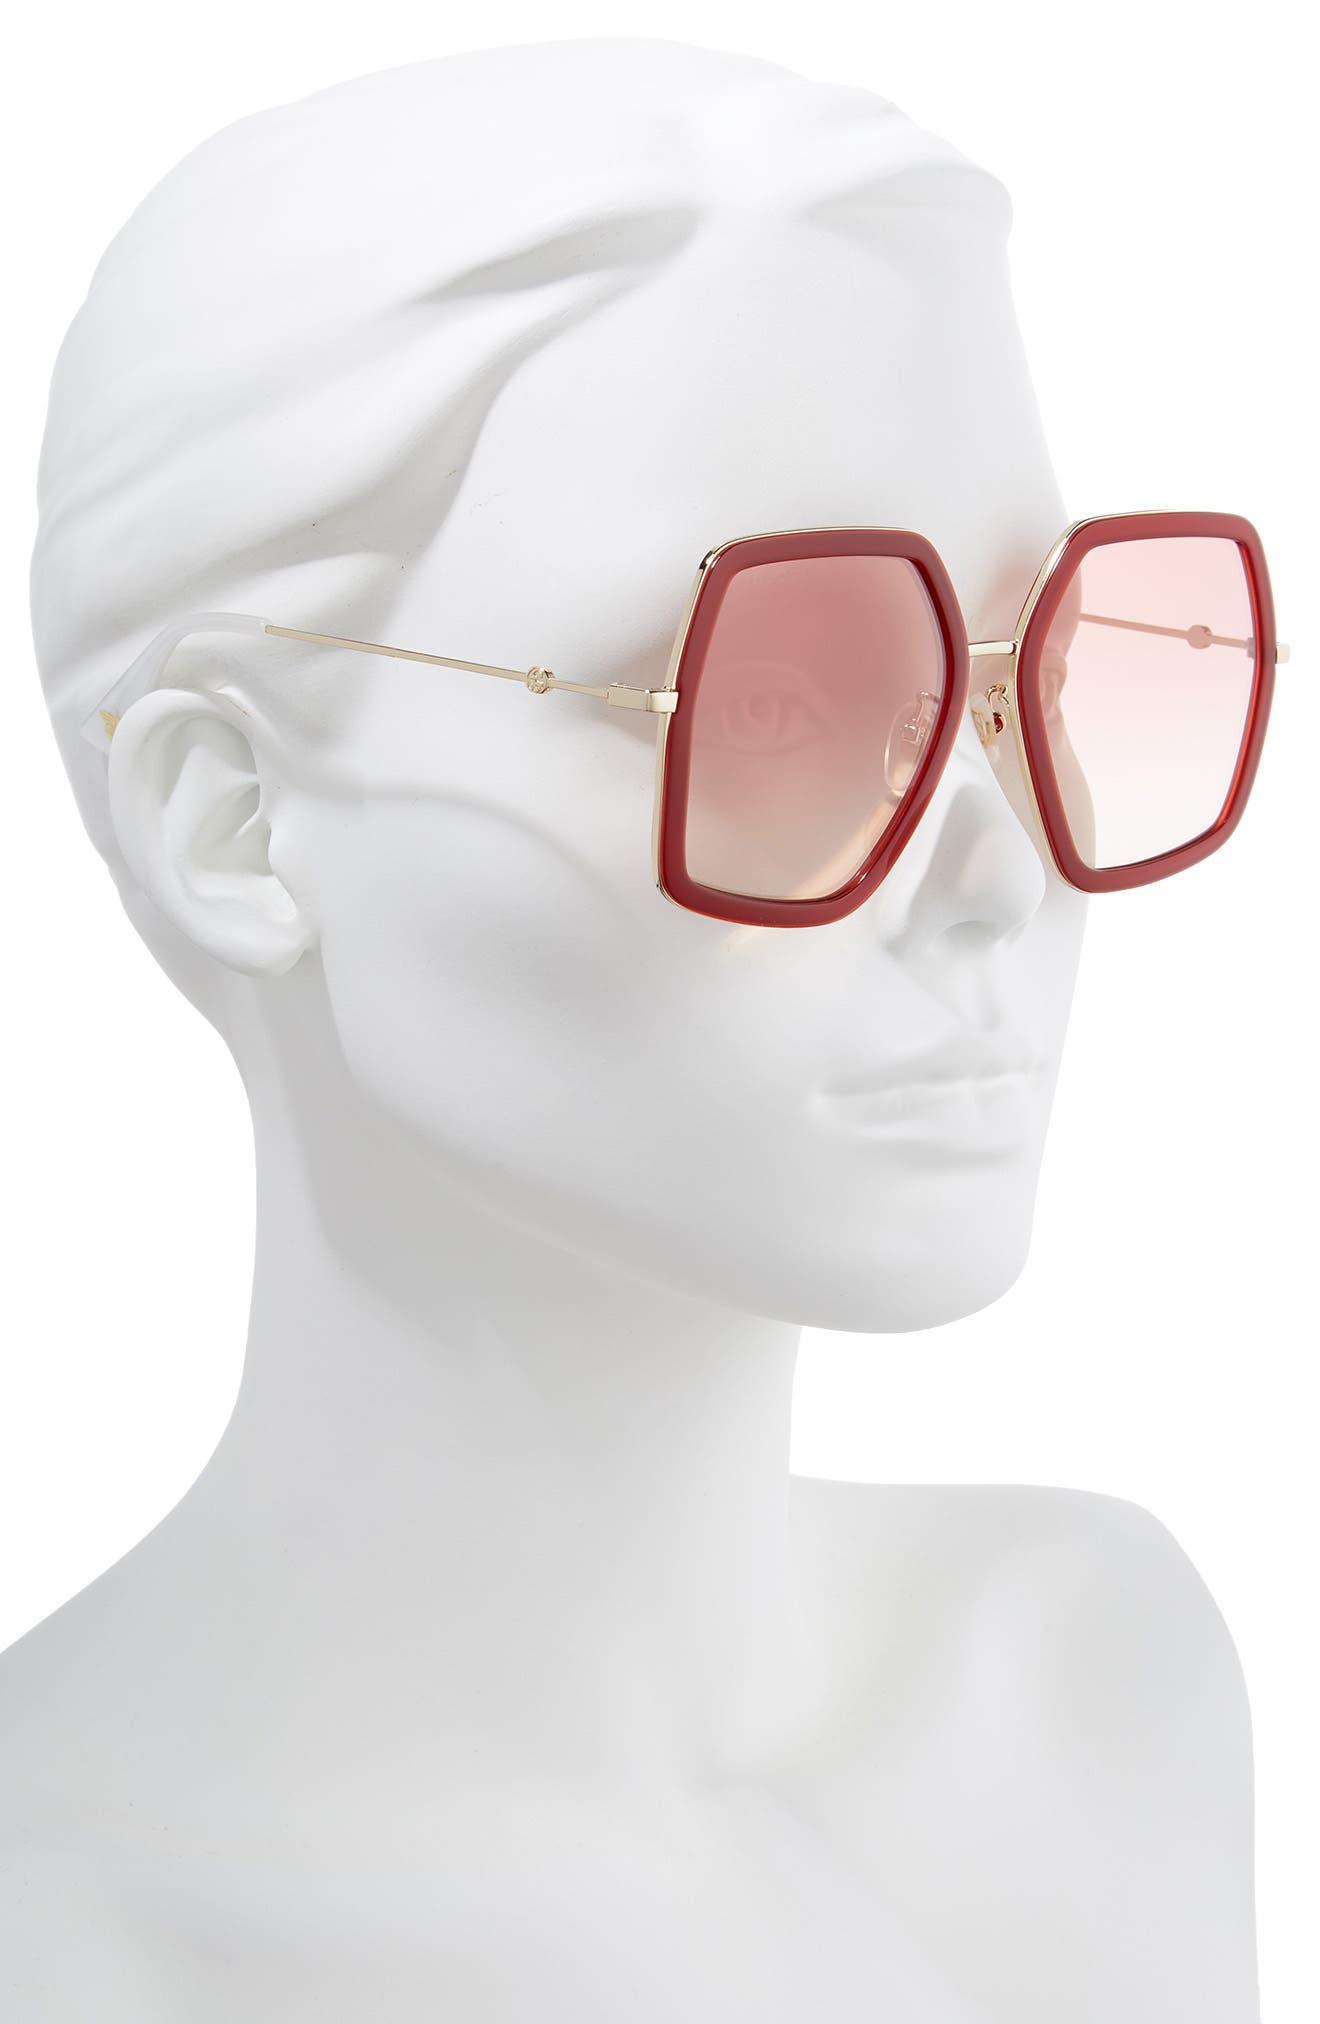 GUCCI, 56mm Sunglasses, Alternate thumbnail 2, color, SHINY ENDURA GLD/PK GRAD MIR